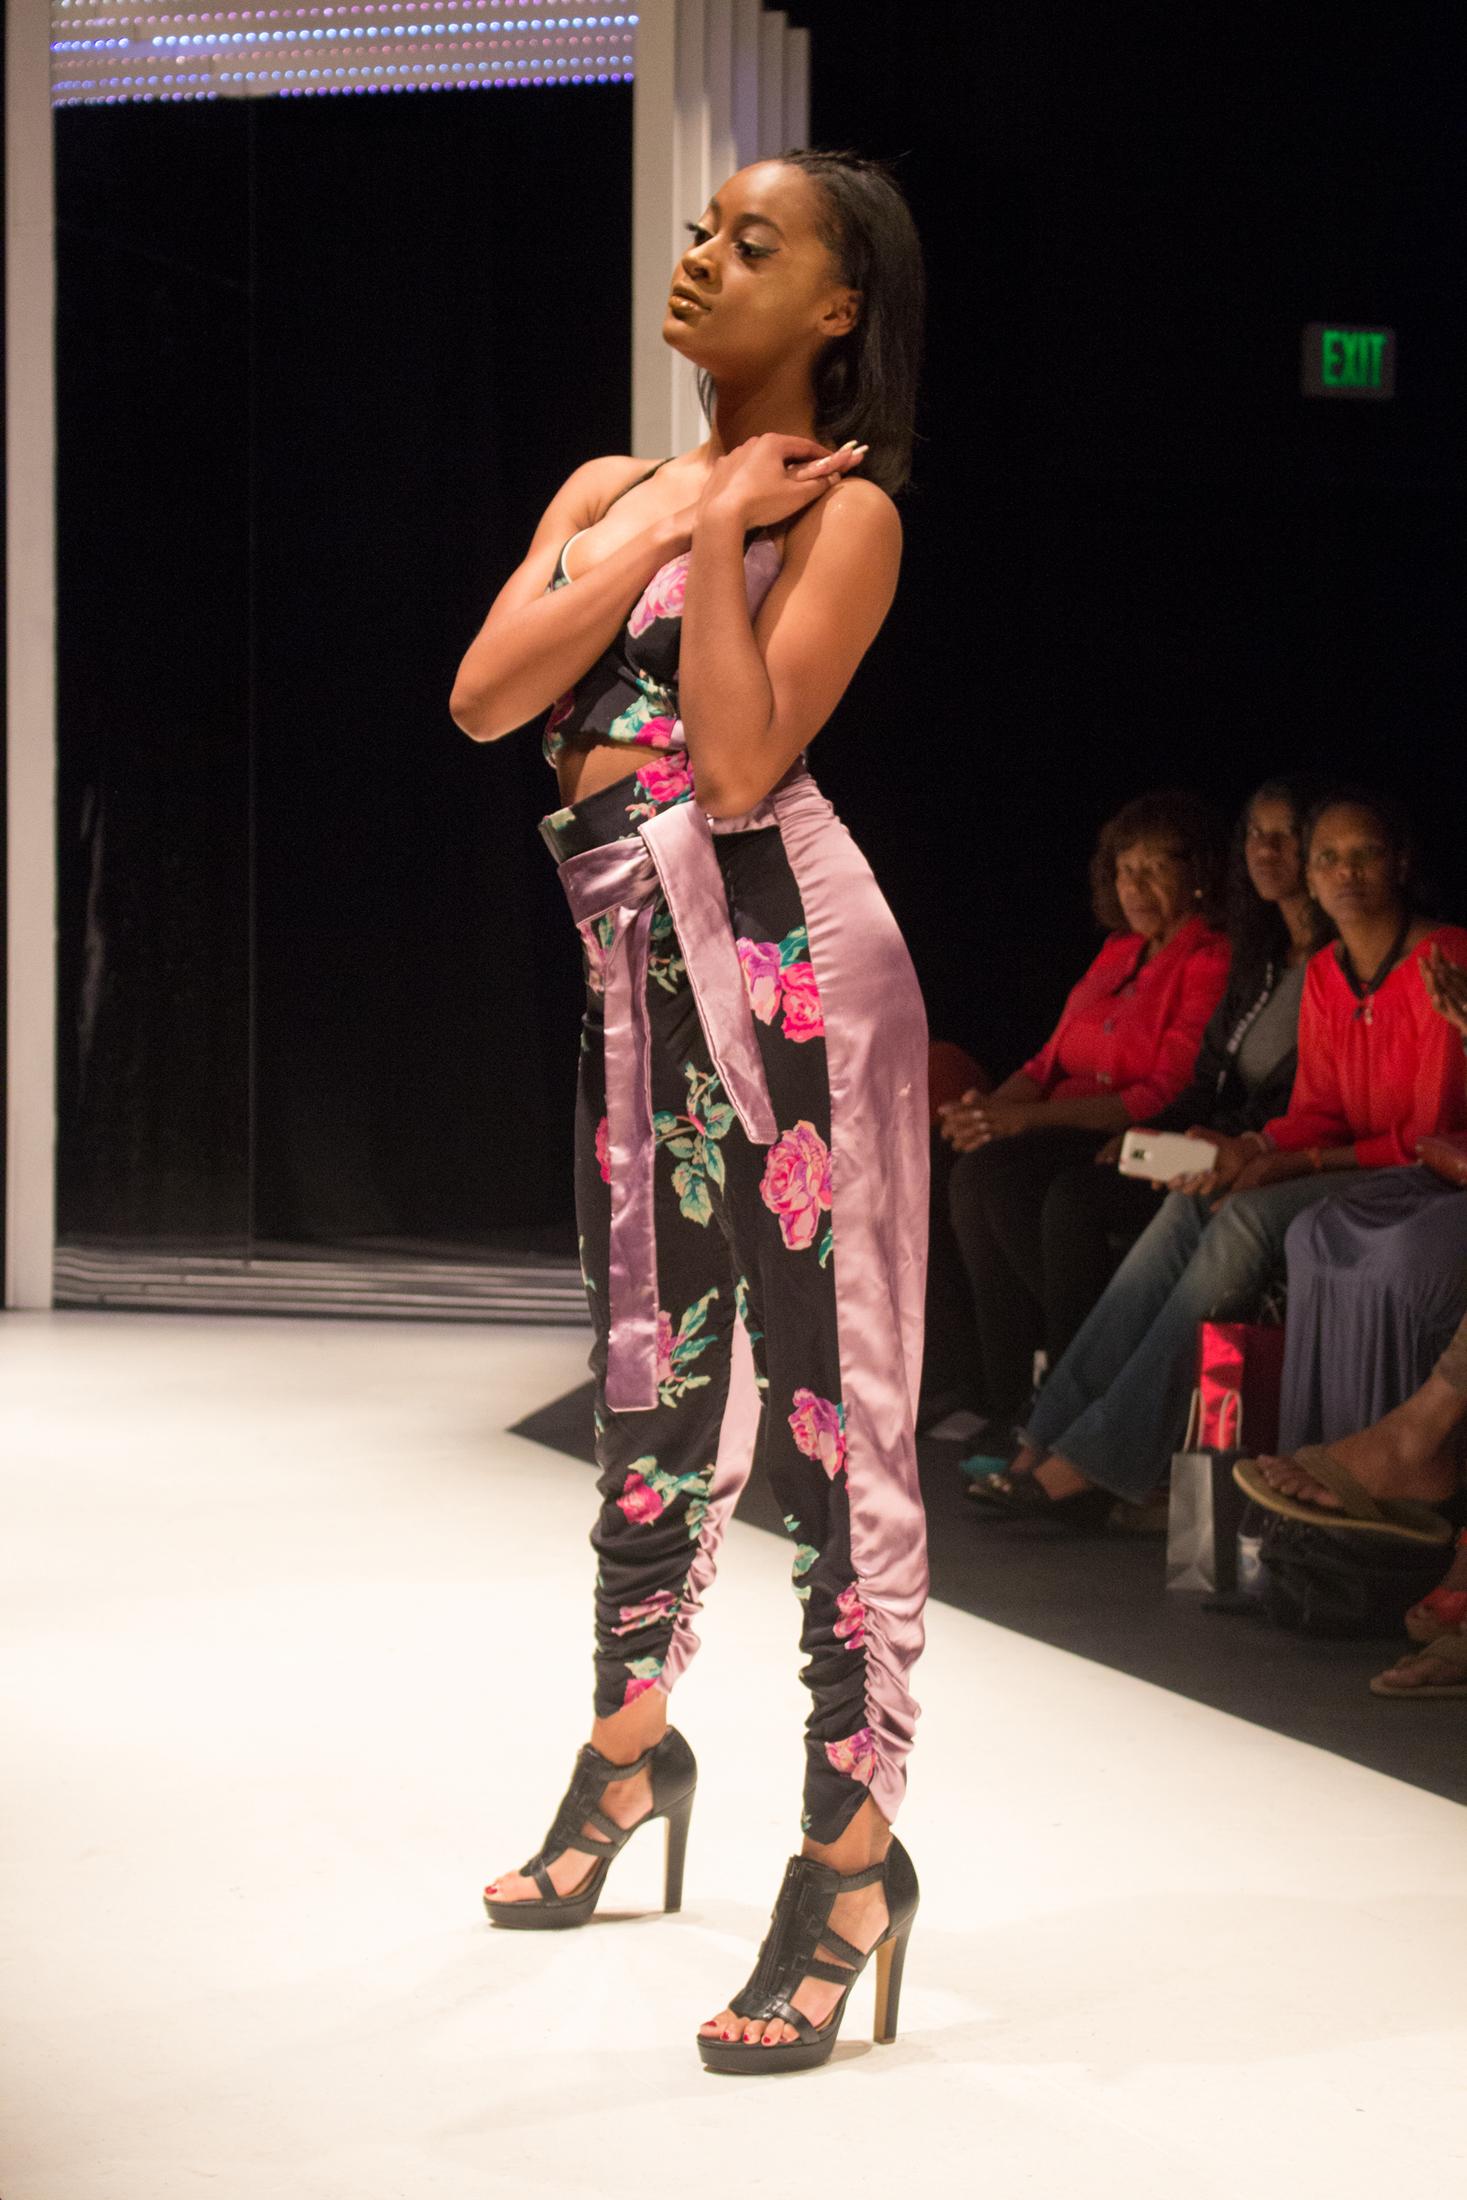 OSA-Fashion-2017-Faythe Wilburn-GregGutbezahl-01.jpg